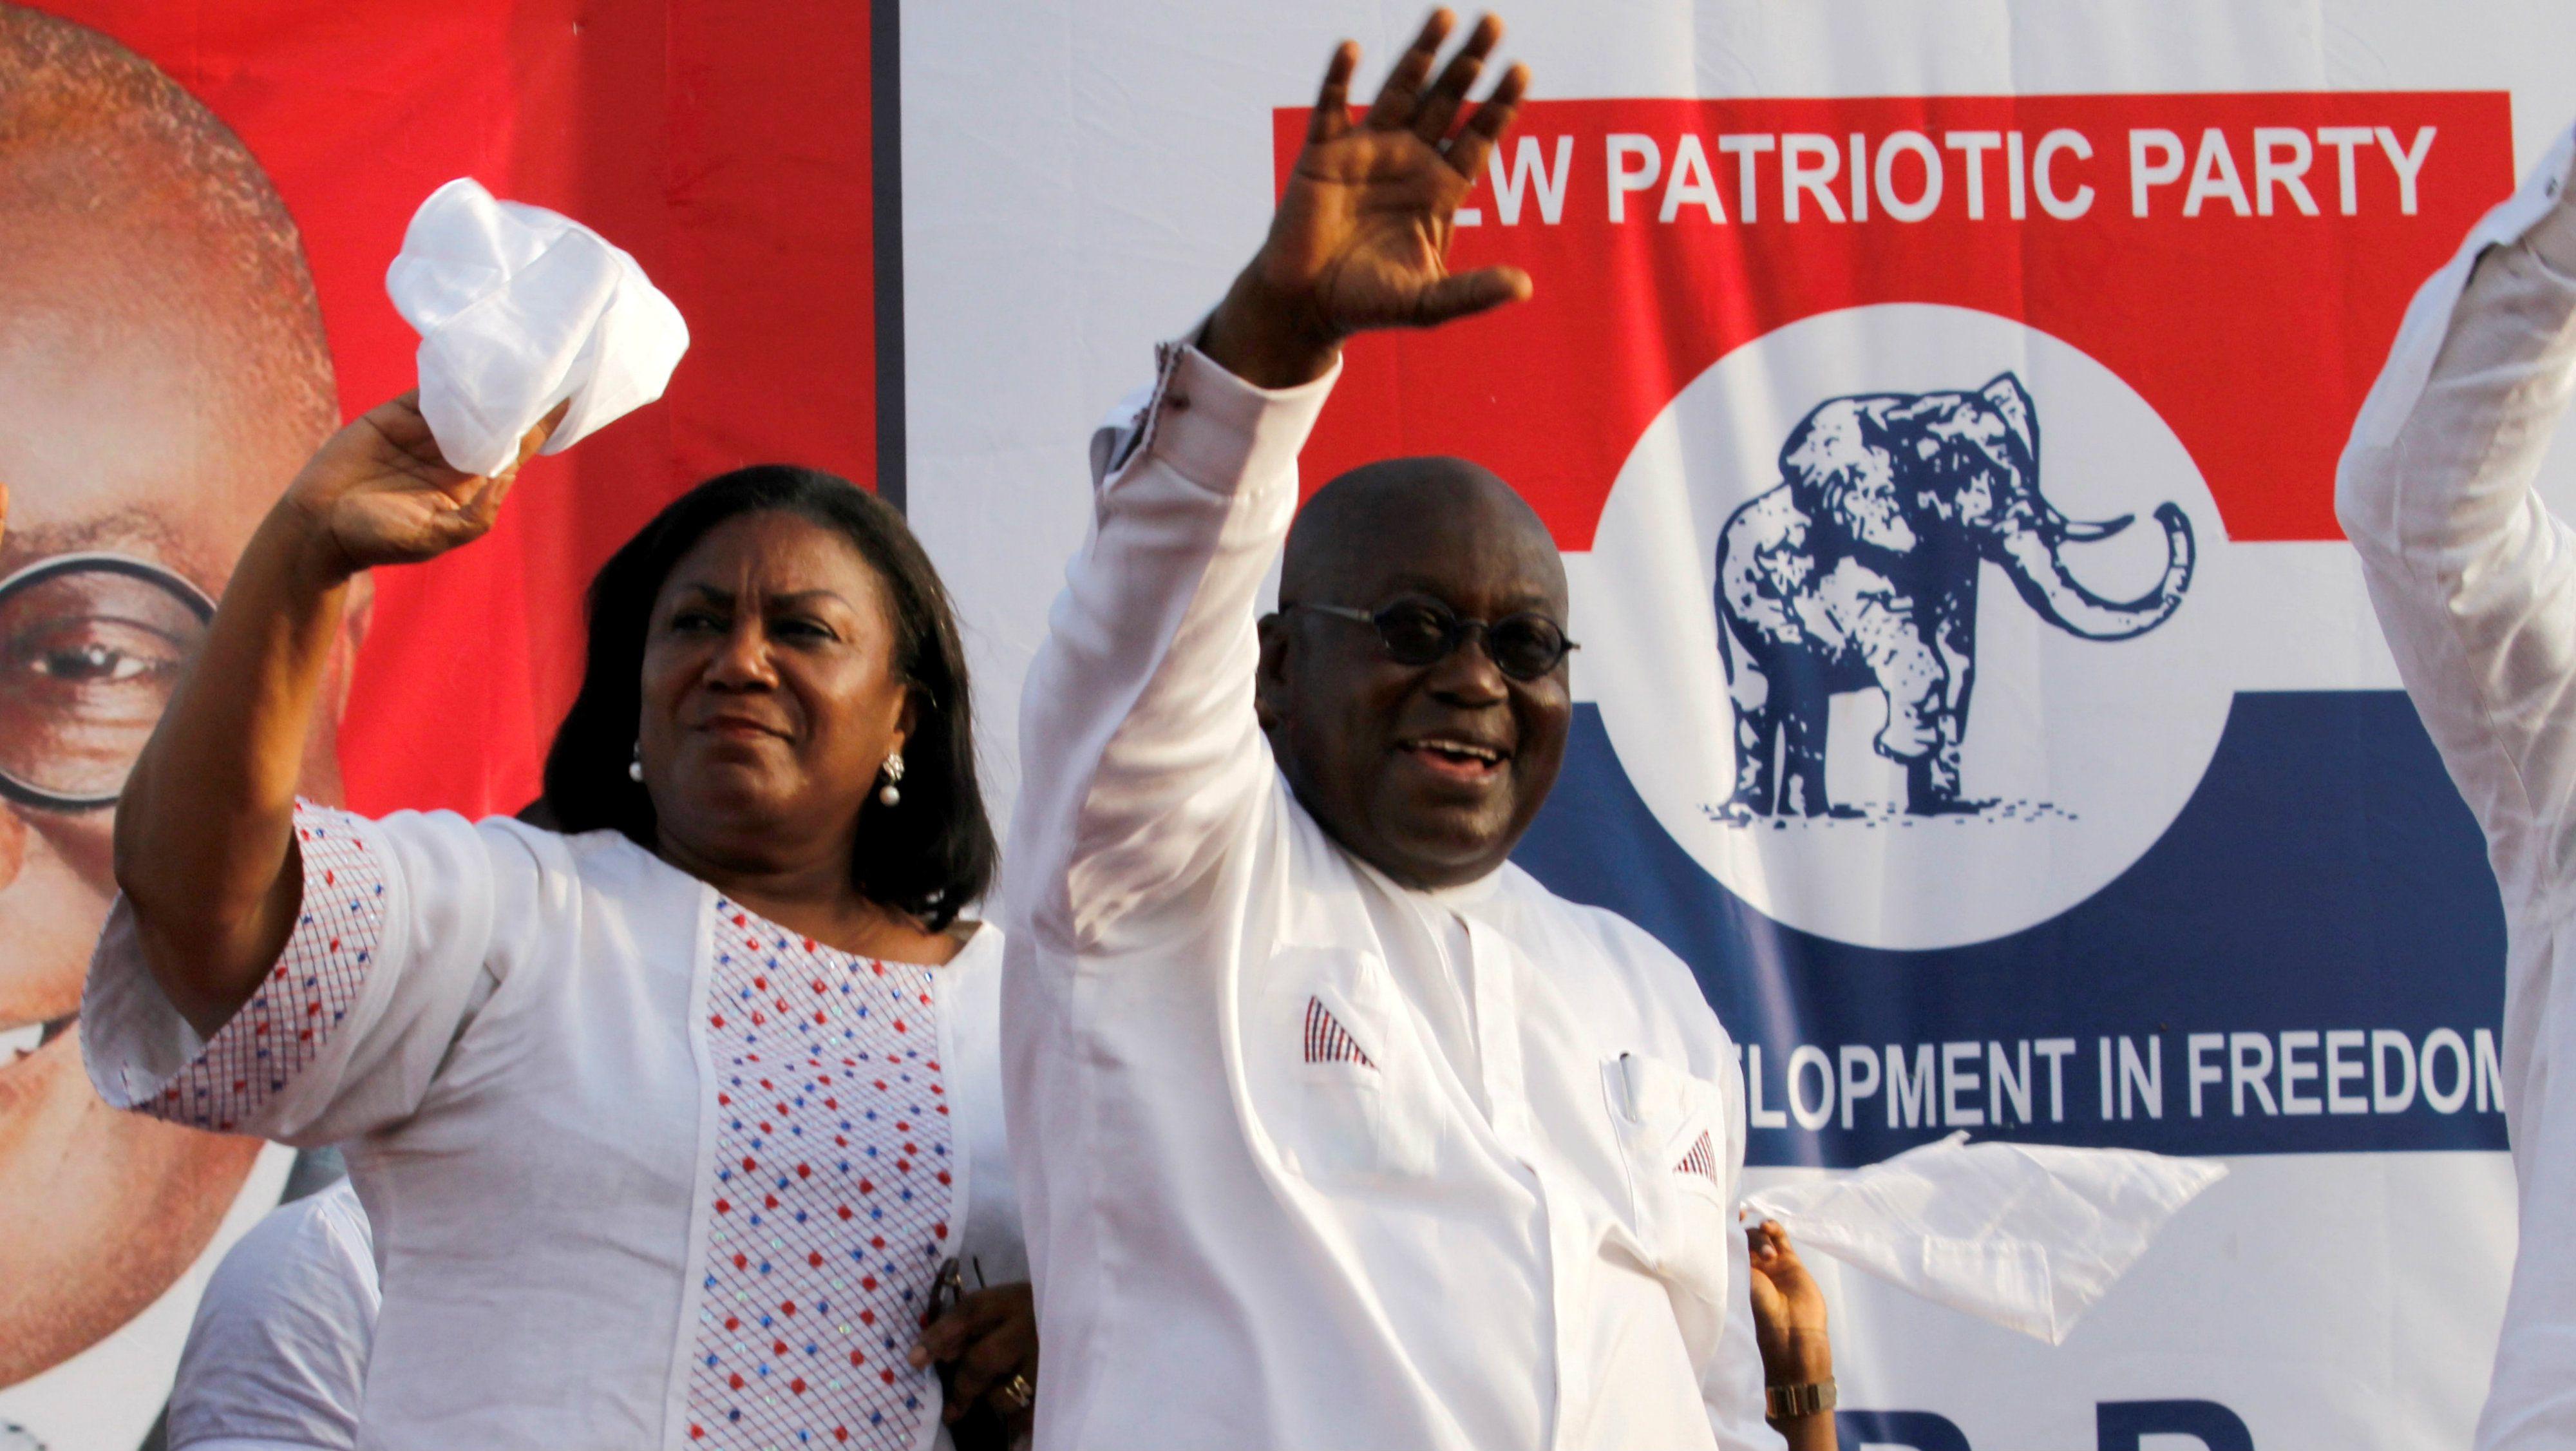 Le président Ghanéen, Nana Akufo-Addo est attendu ce lundi à Dakar